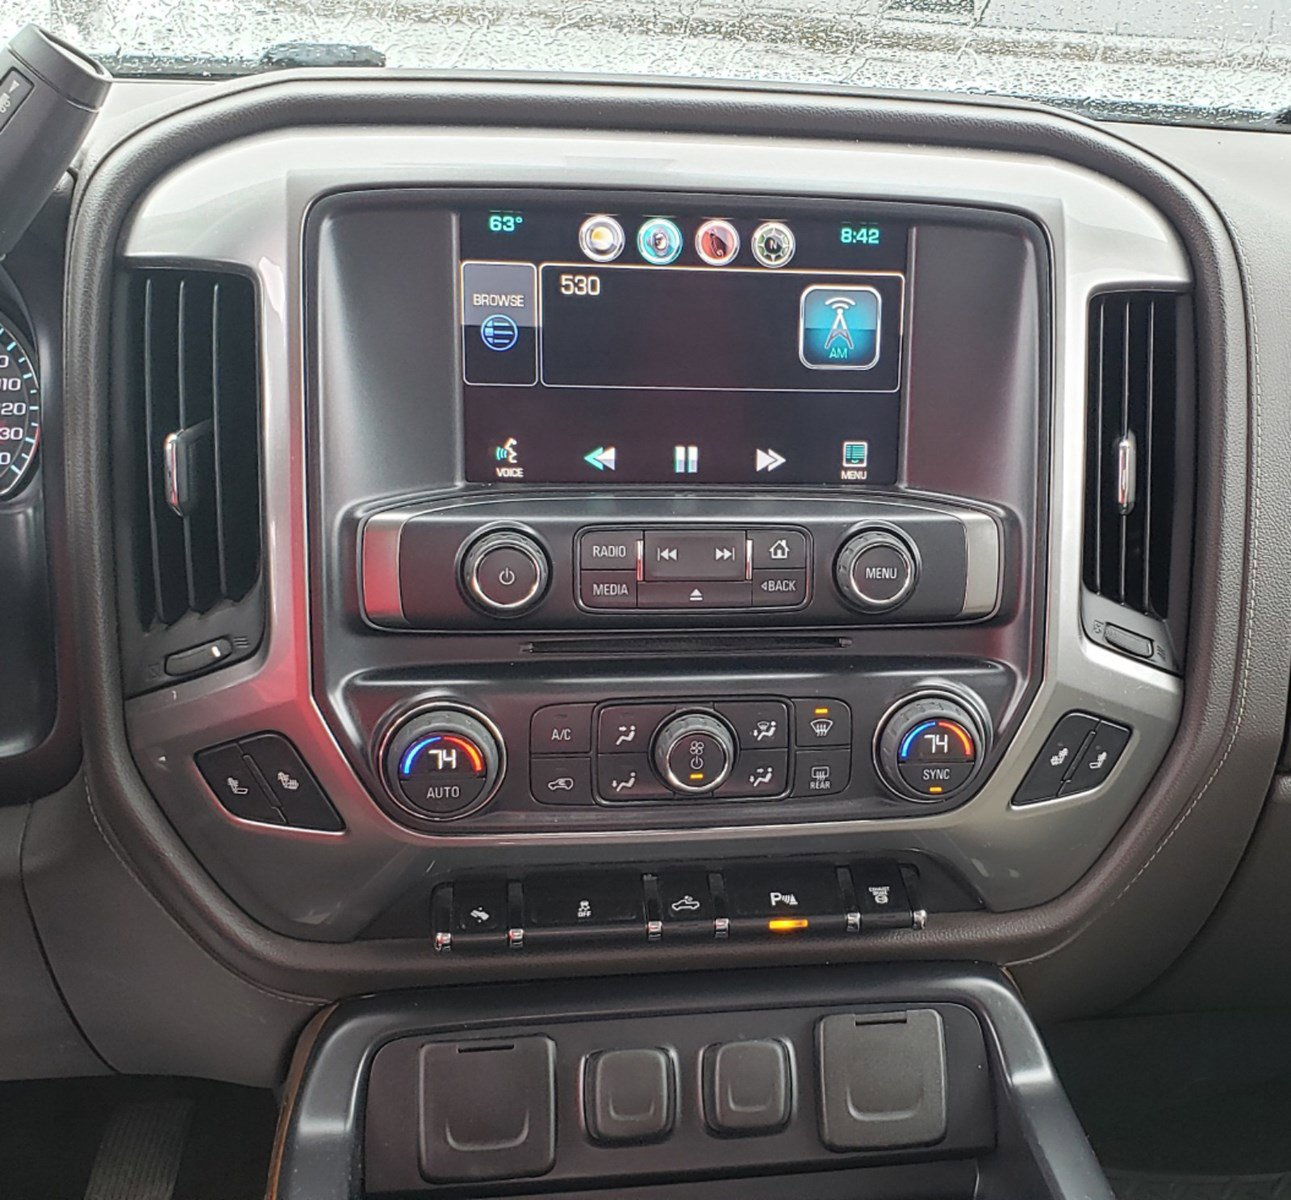 Pre-Owned 2015 Chevrolet Silverado 3500HD Built After Aug 14 LTZ